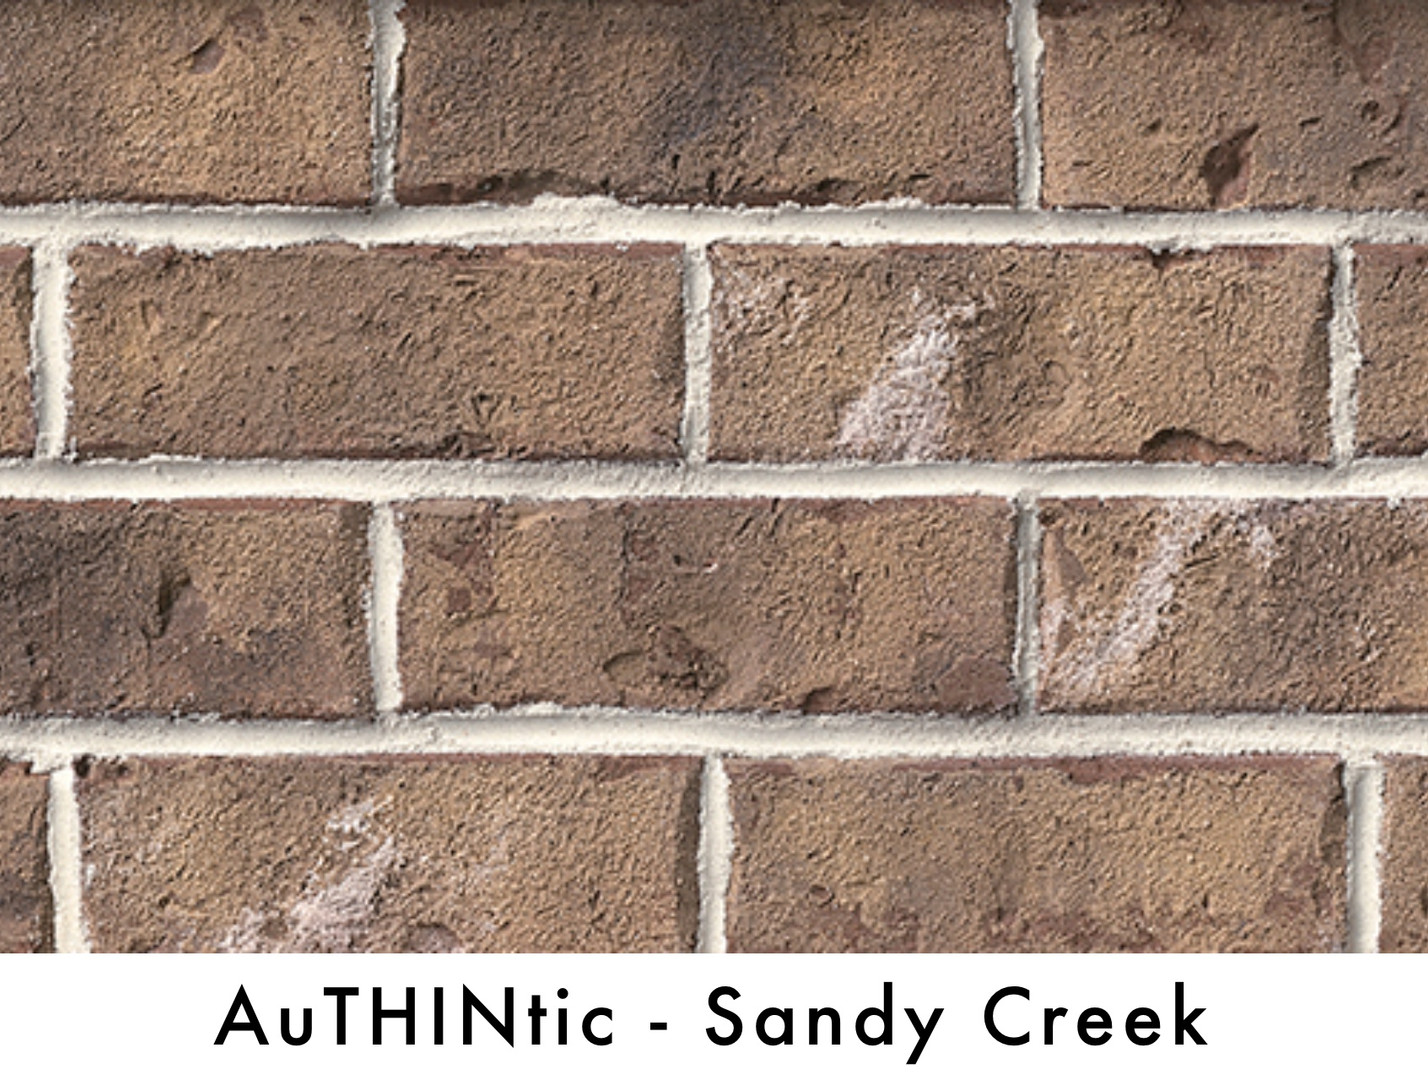 AuthinticsSandyCreek.jpg